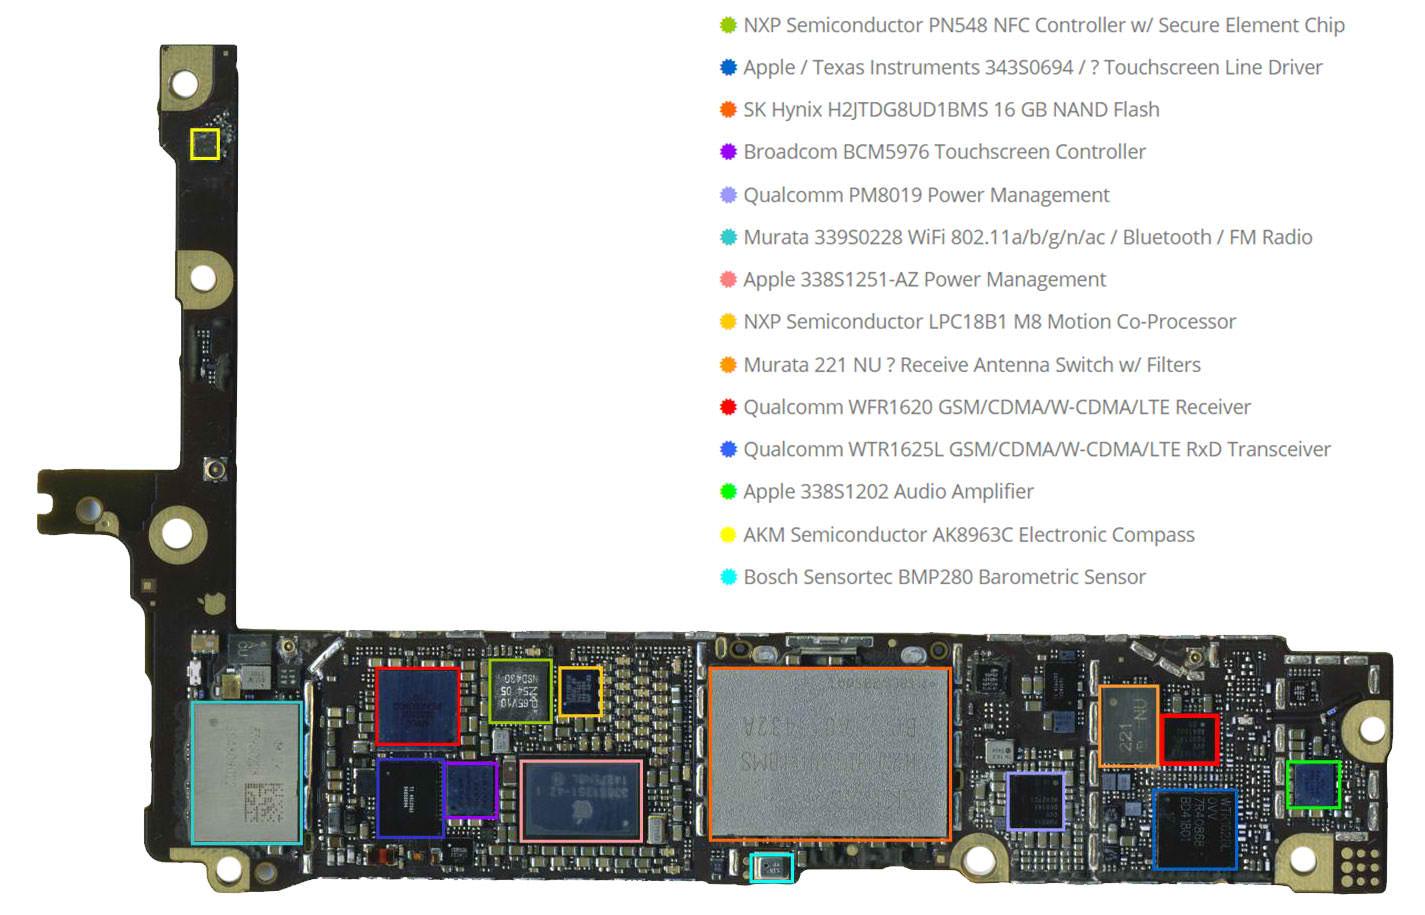 iphone 6 plus schematic diagram basic hardware tips and tricks iphone 6 plus circuit board diagram [ 1425 x 915 Pixel ]